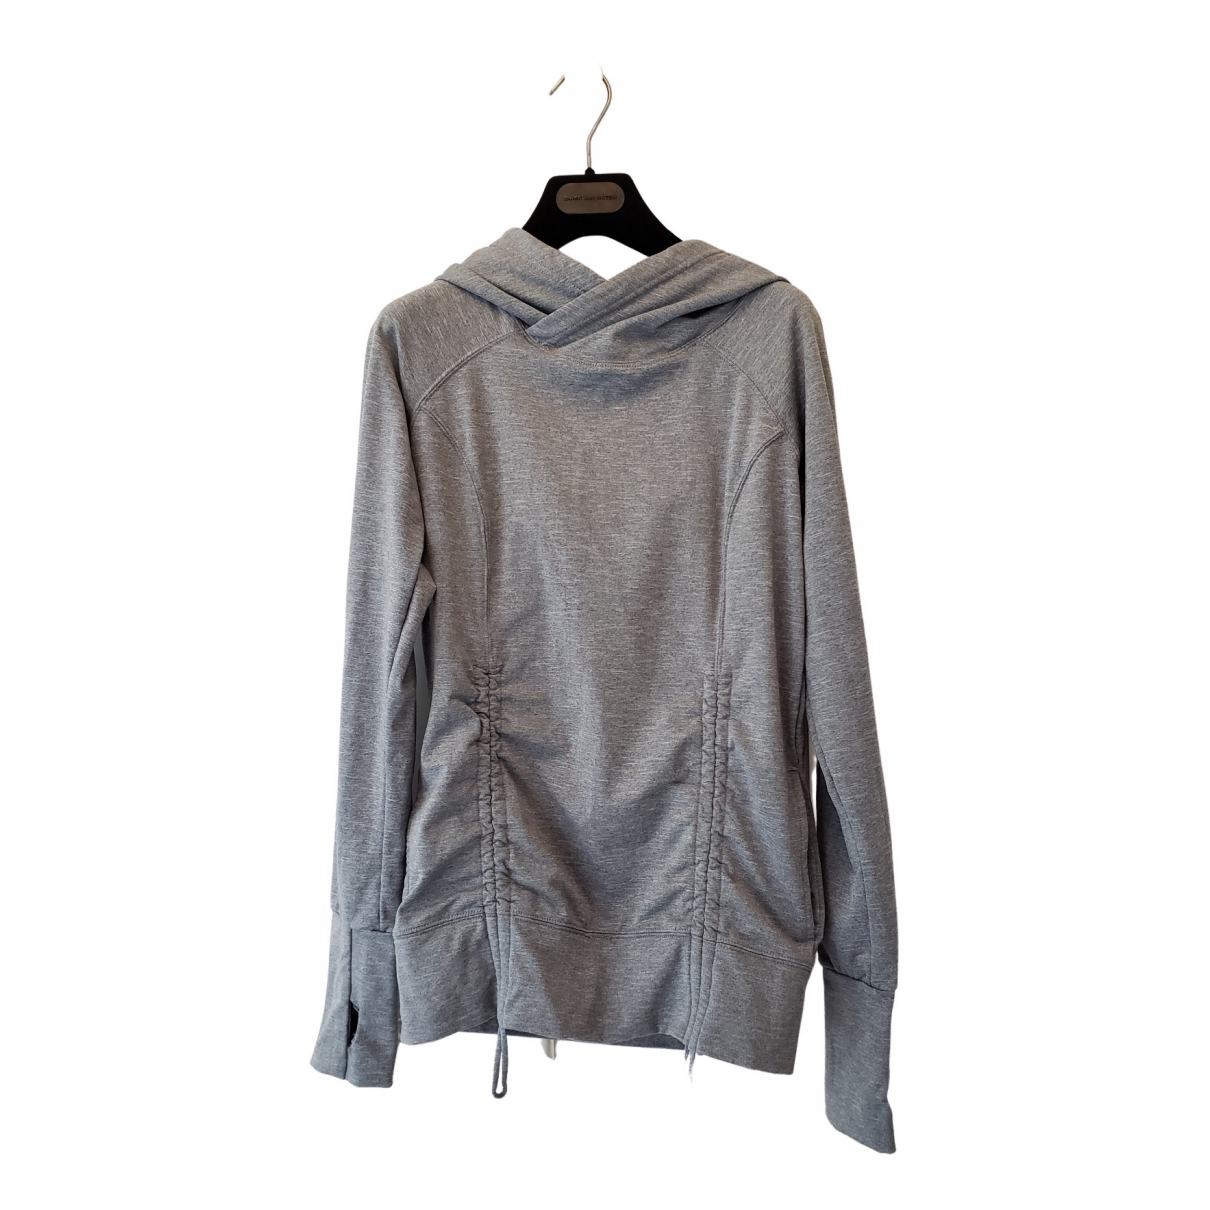 Sweaty Betty - Top   pour femme - gris